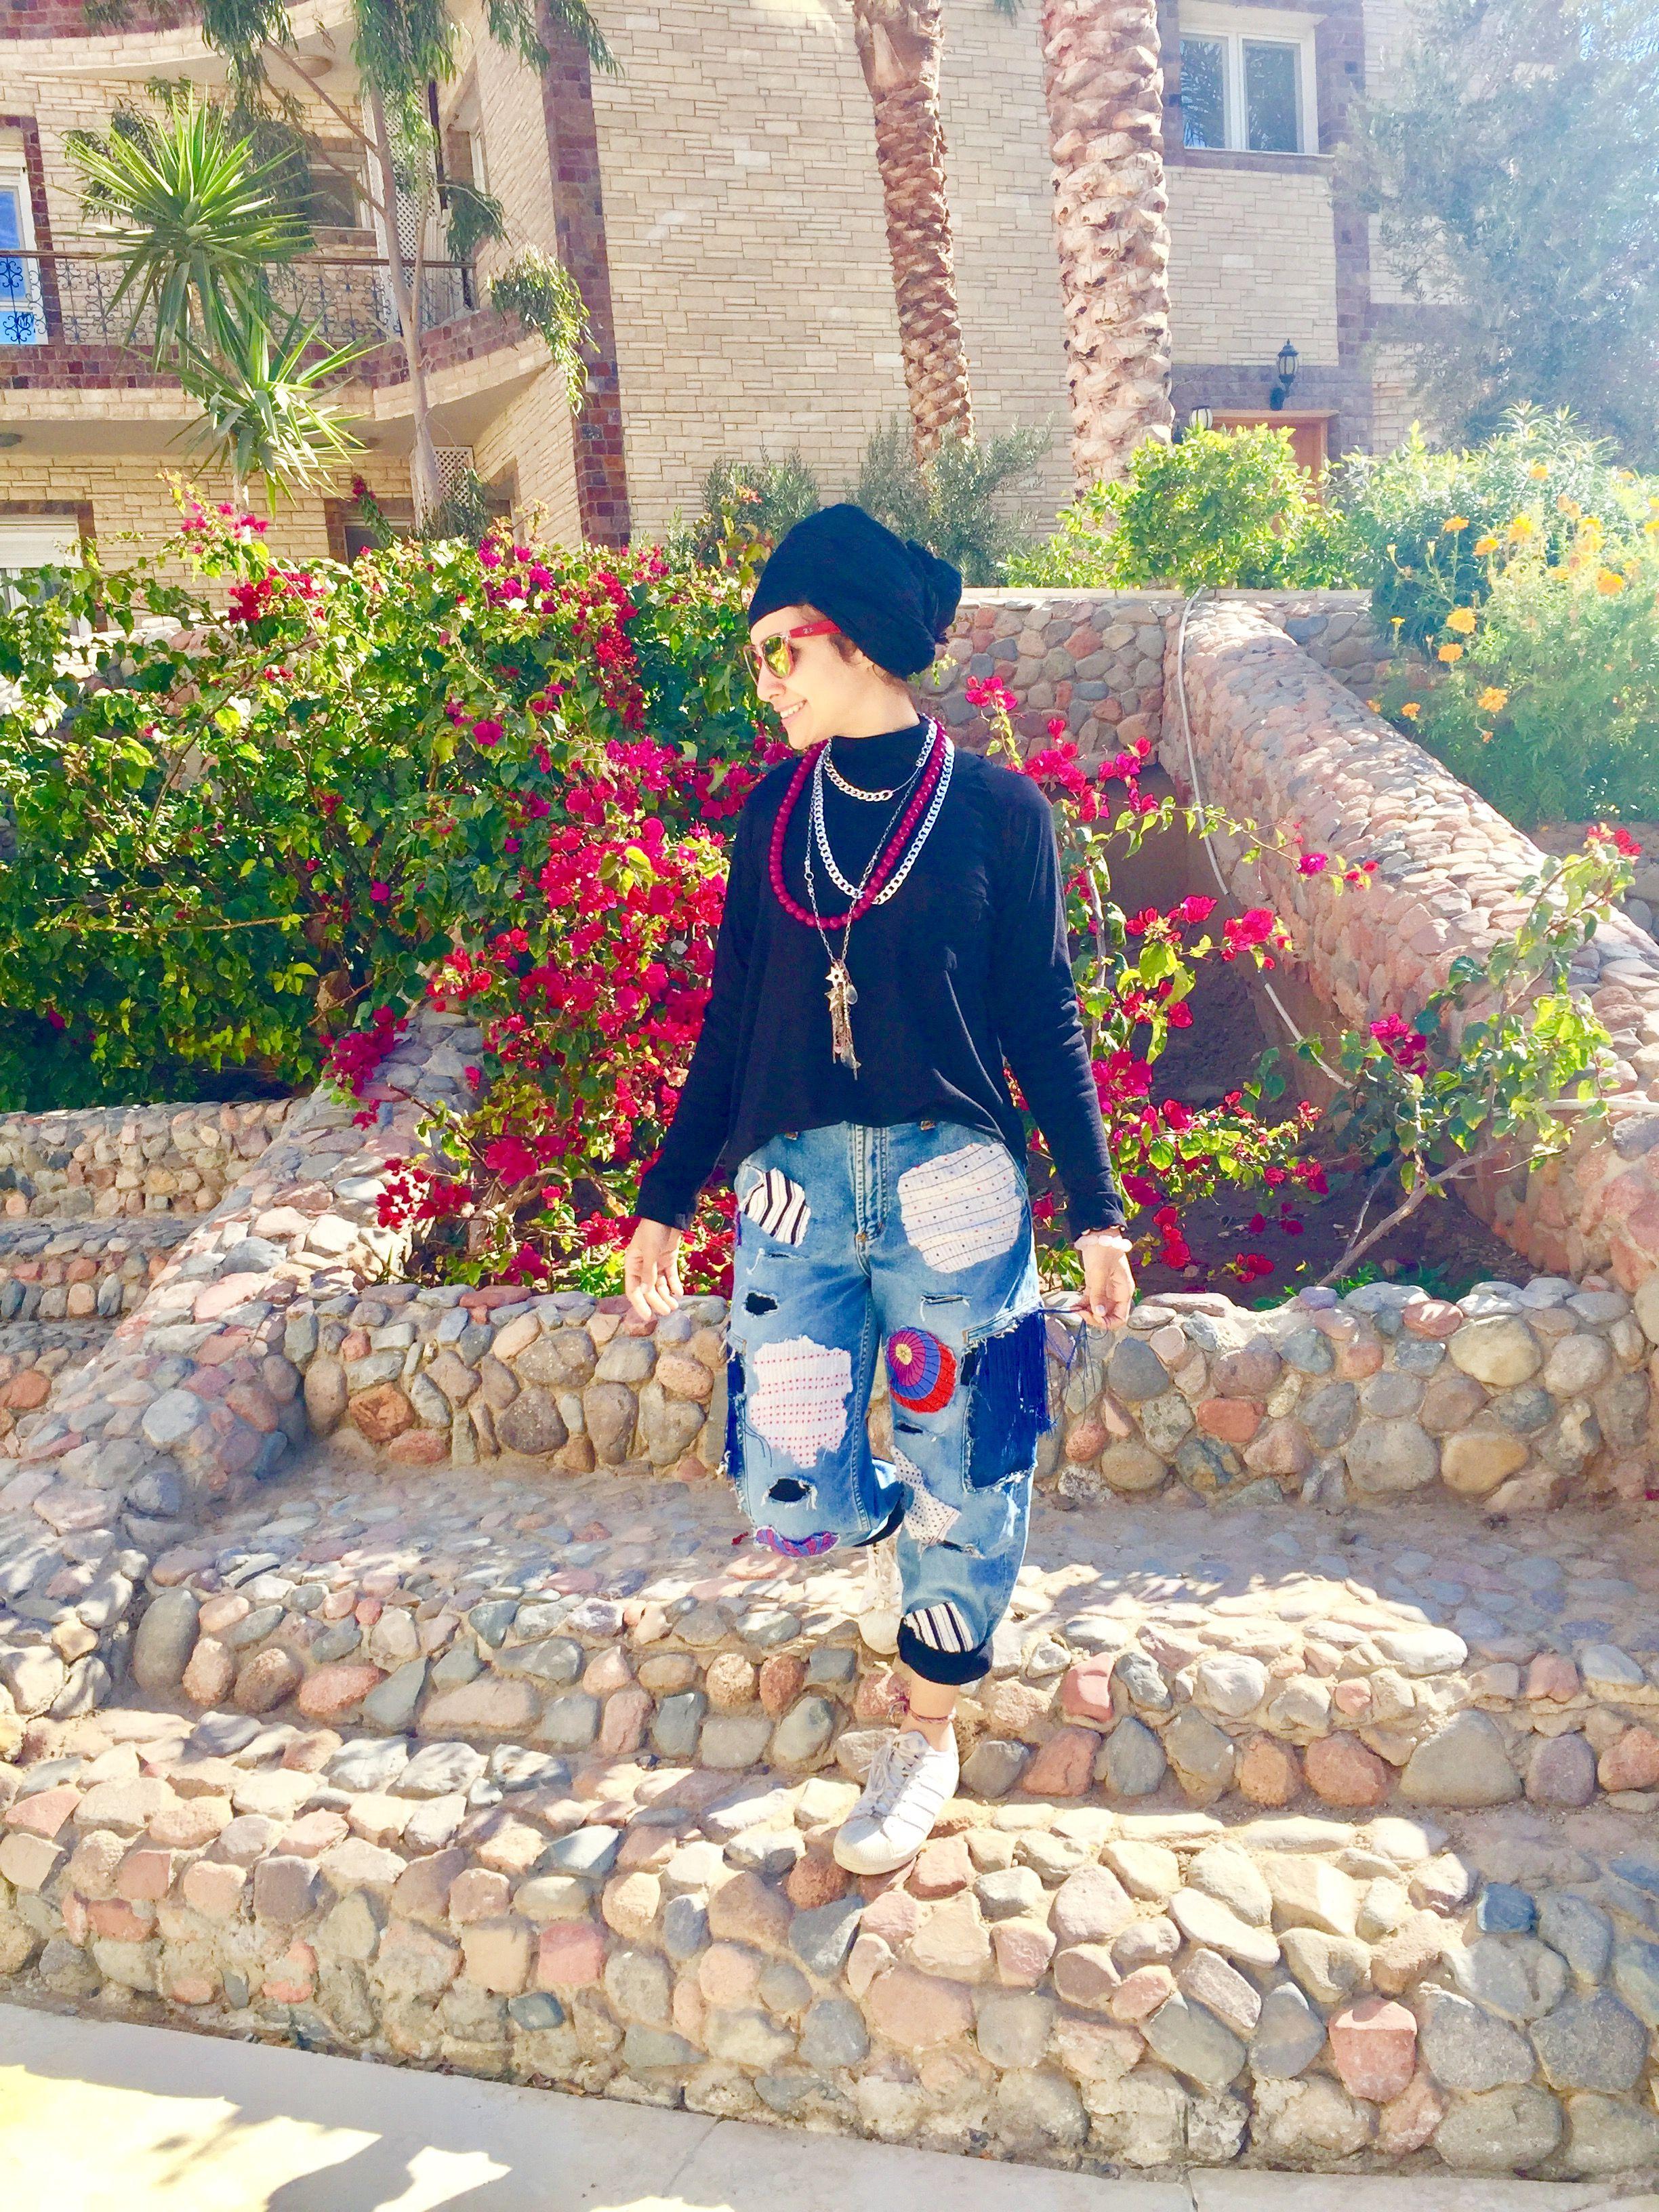 My favorite design ✂️#fashion#stylist#colorful #styleblog#ood#blogger#streetstyle#mennaelgedamy#egypt#cairo#trendy#intspiration#chic#elegent#streettrend#mode#art#details#accessories#designer#fashionesta